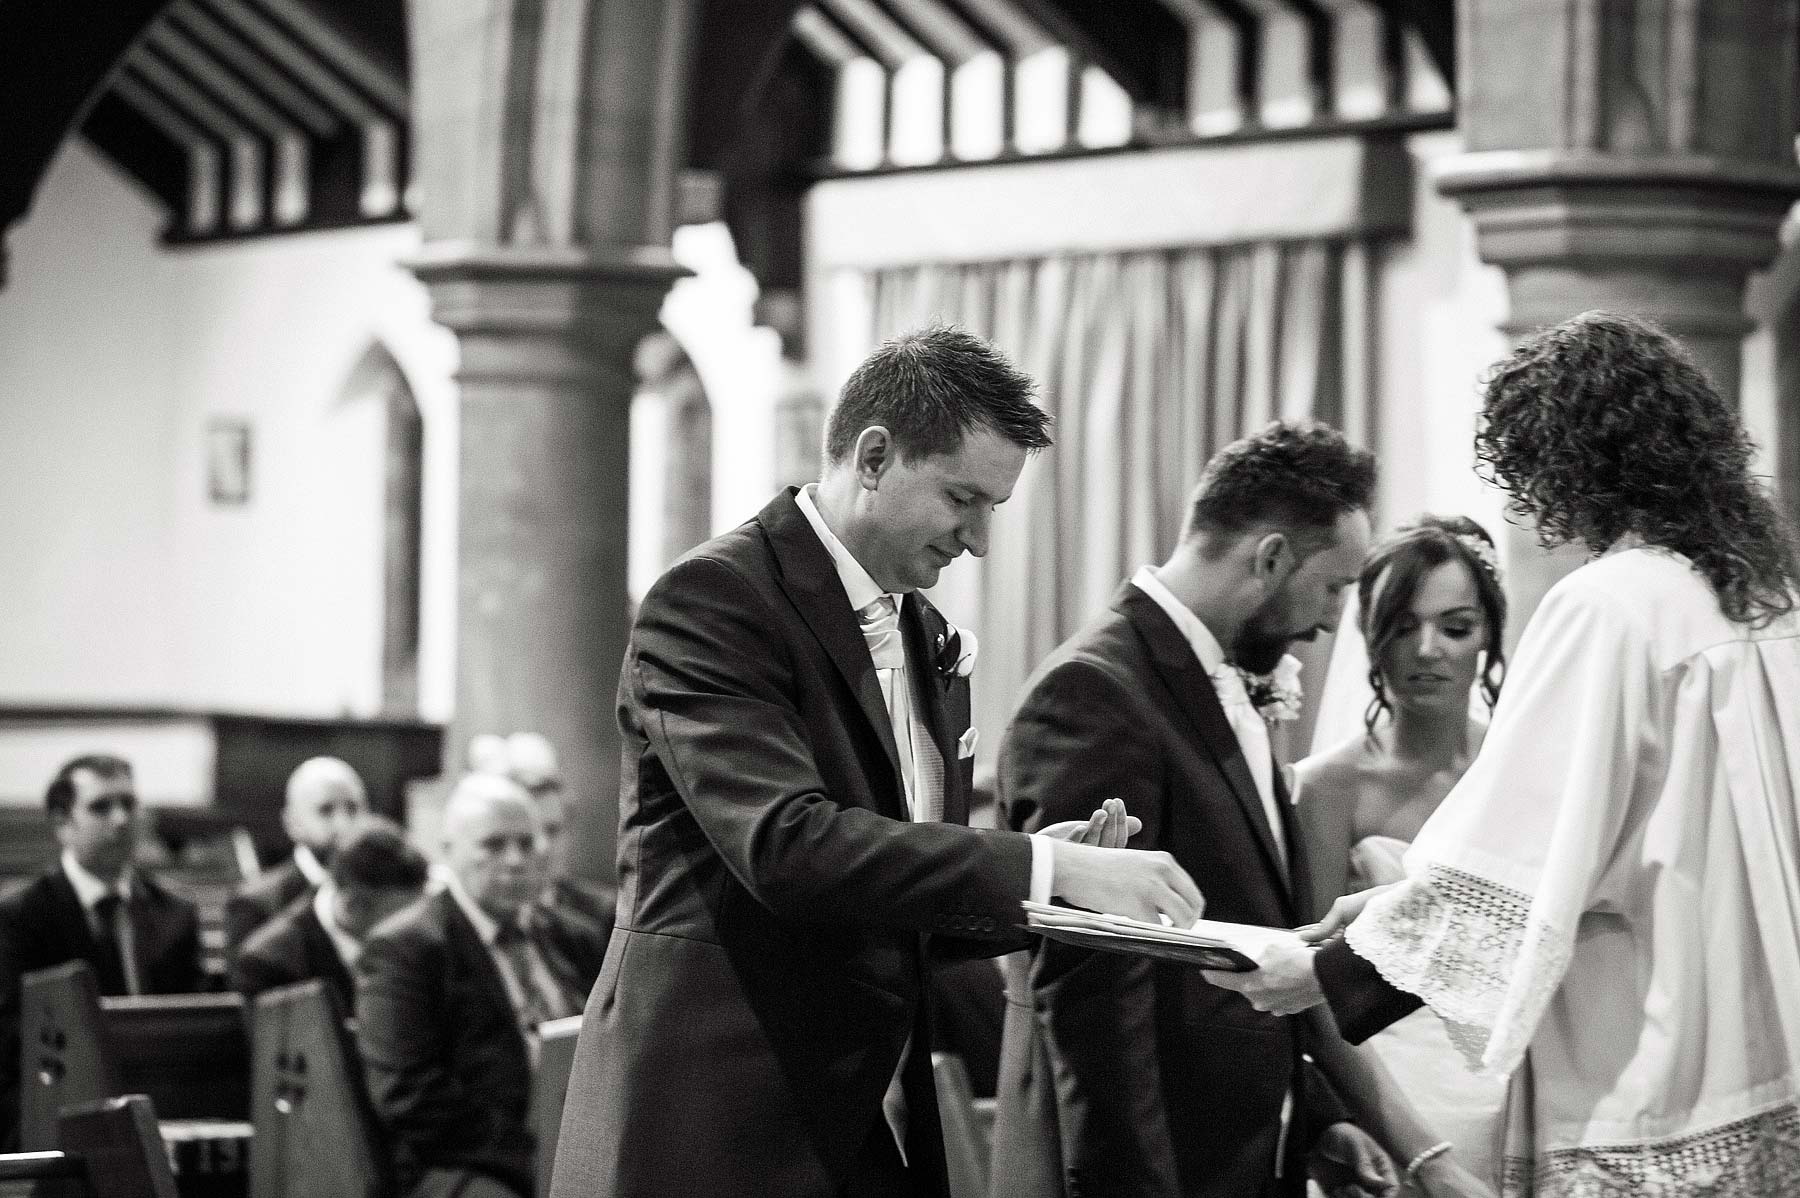 moat-house-church-wedding-photographs-022